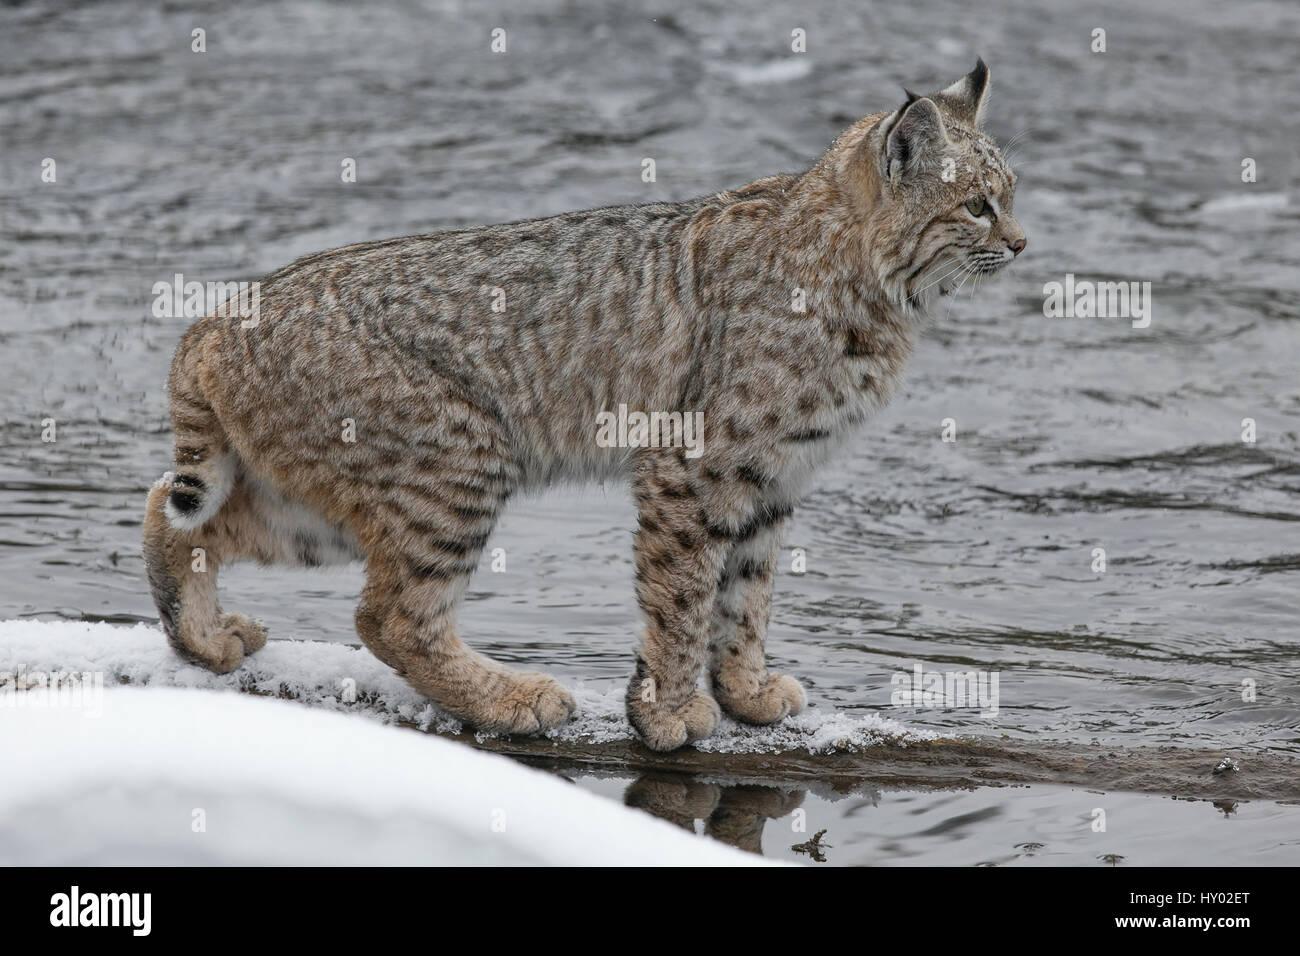 Bobcat (Lynx rufus) pausing on snowy river bank, Yellowstone, USA. January. - Stock Image